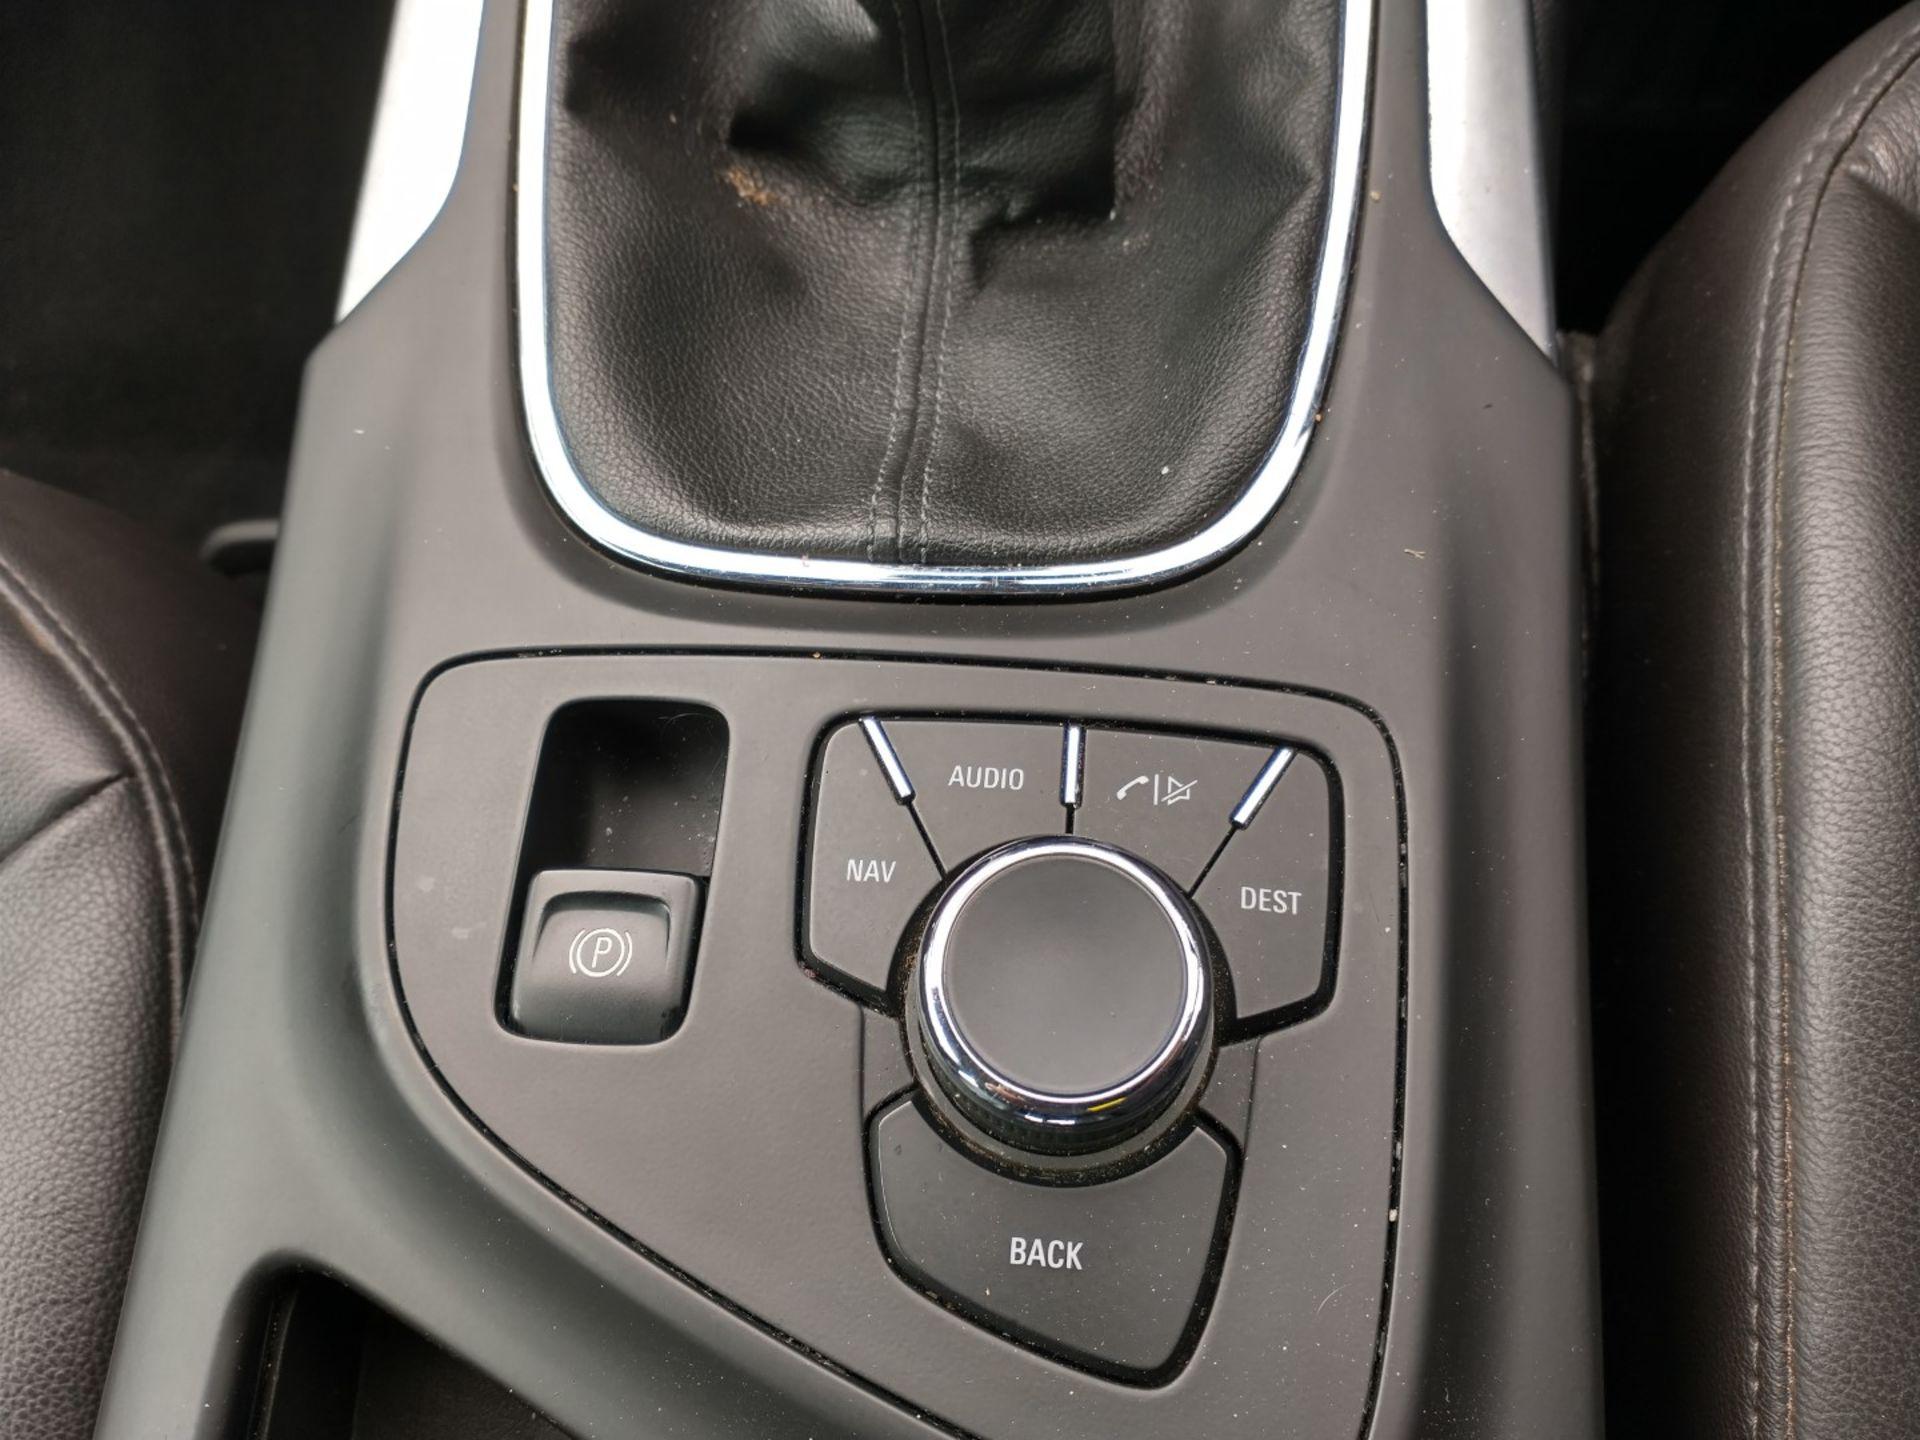 2009 Vauxhall Insignia Elite Nav CDTI 5dr 2.0 Diesel - CL505 - NO VAT ON THE HAMMER - Location: Corb - Image 19 of 22